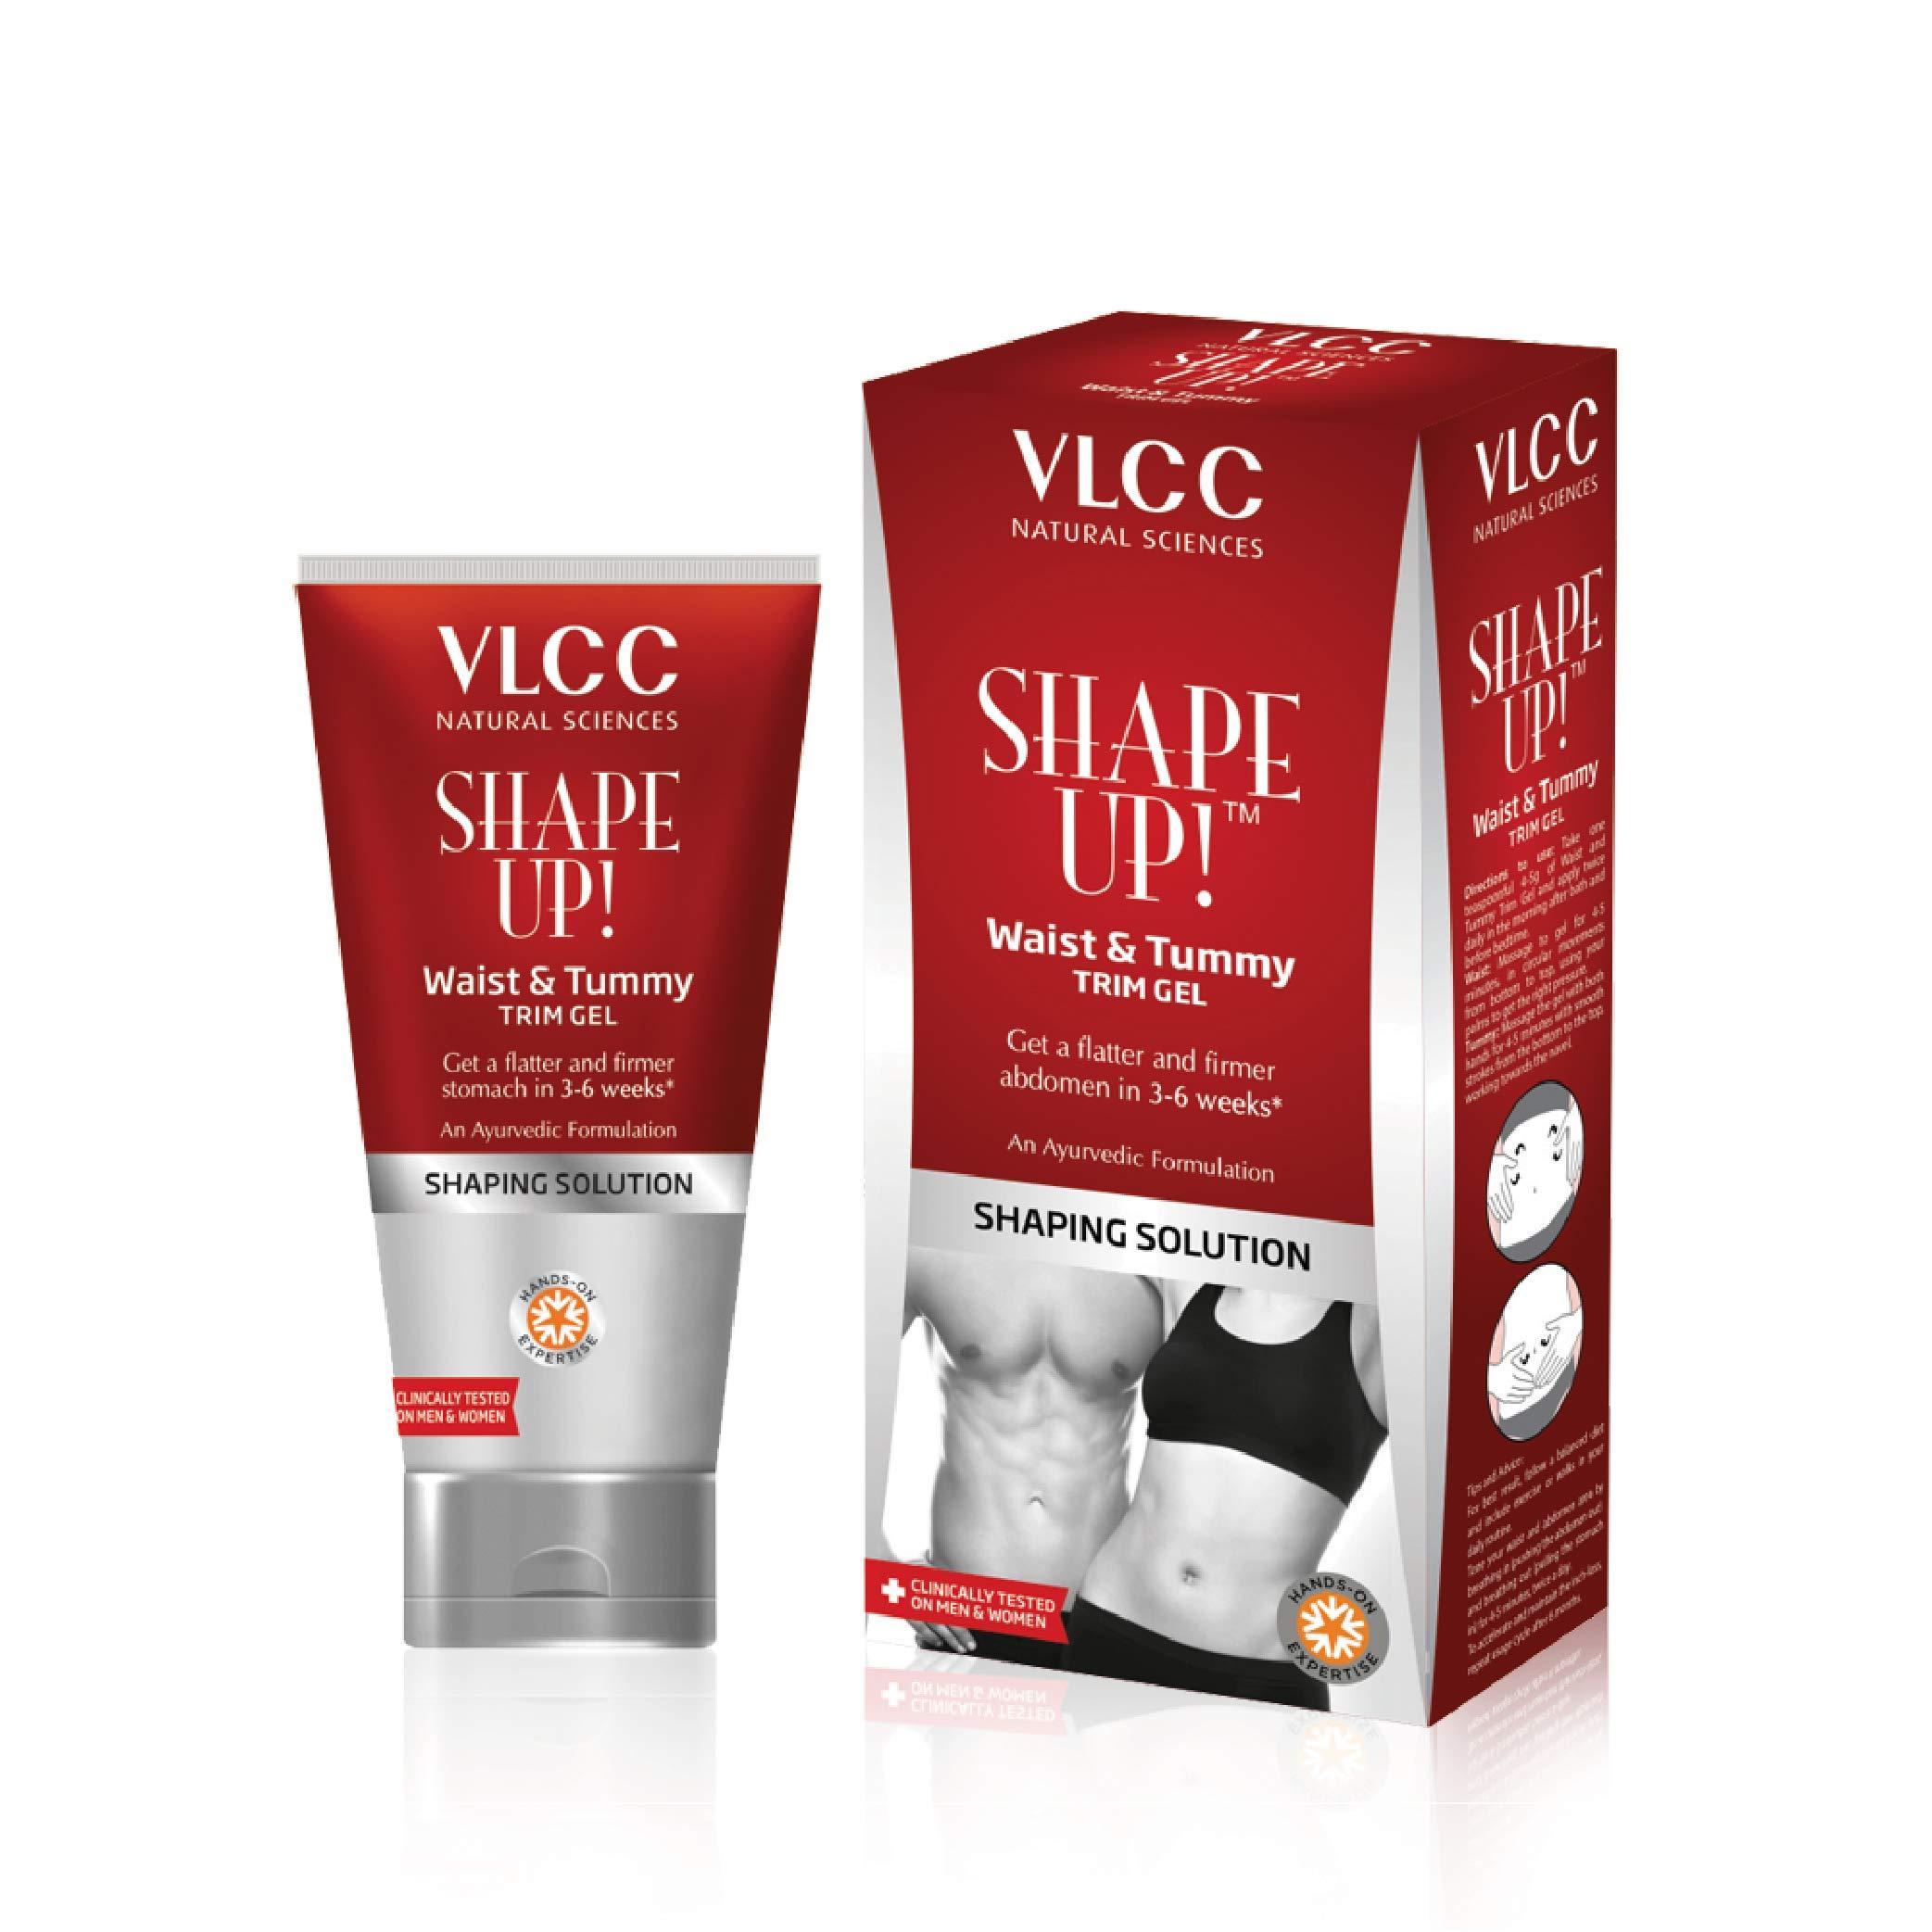 VLCC Natural Sciences Shape up Waist and Tummy Trim Gel 100g